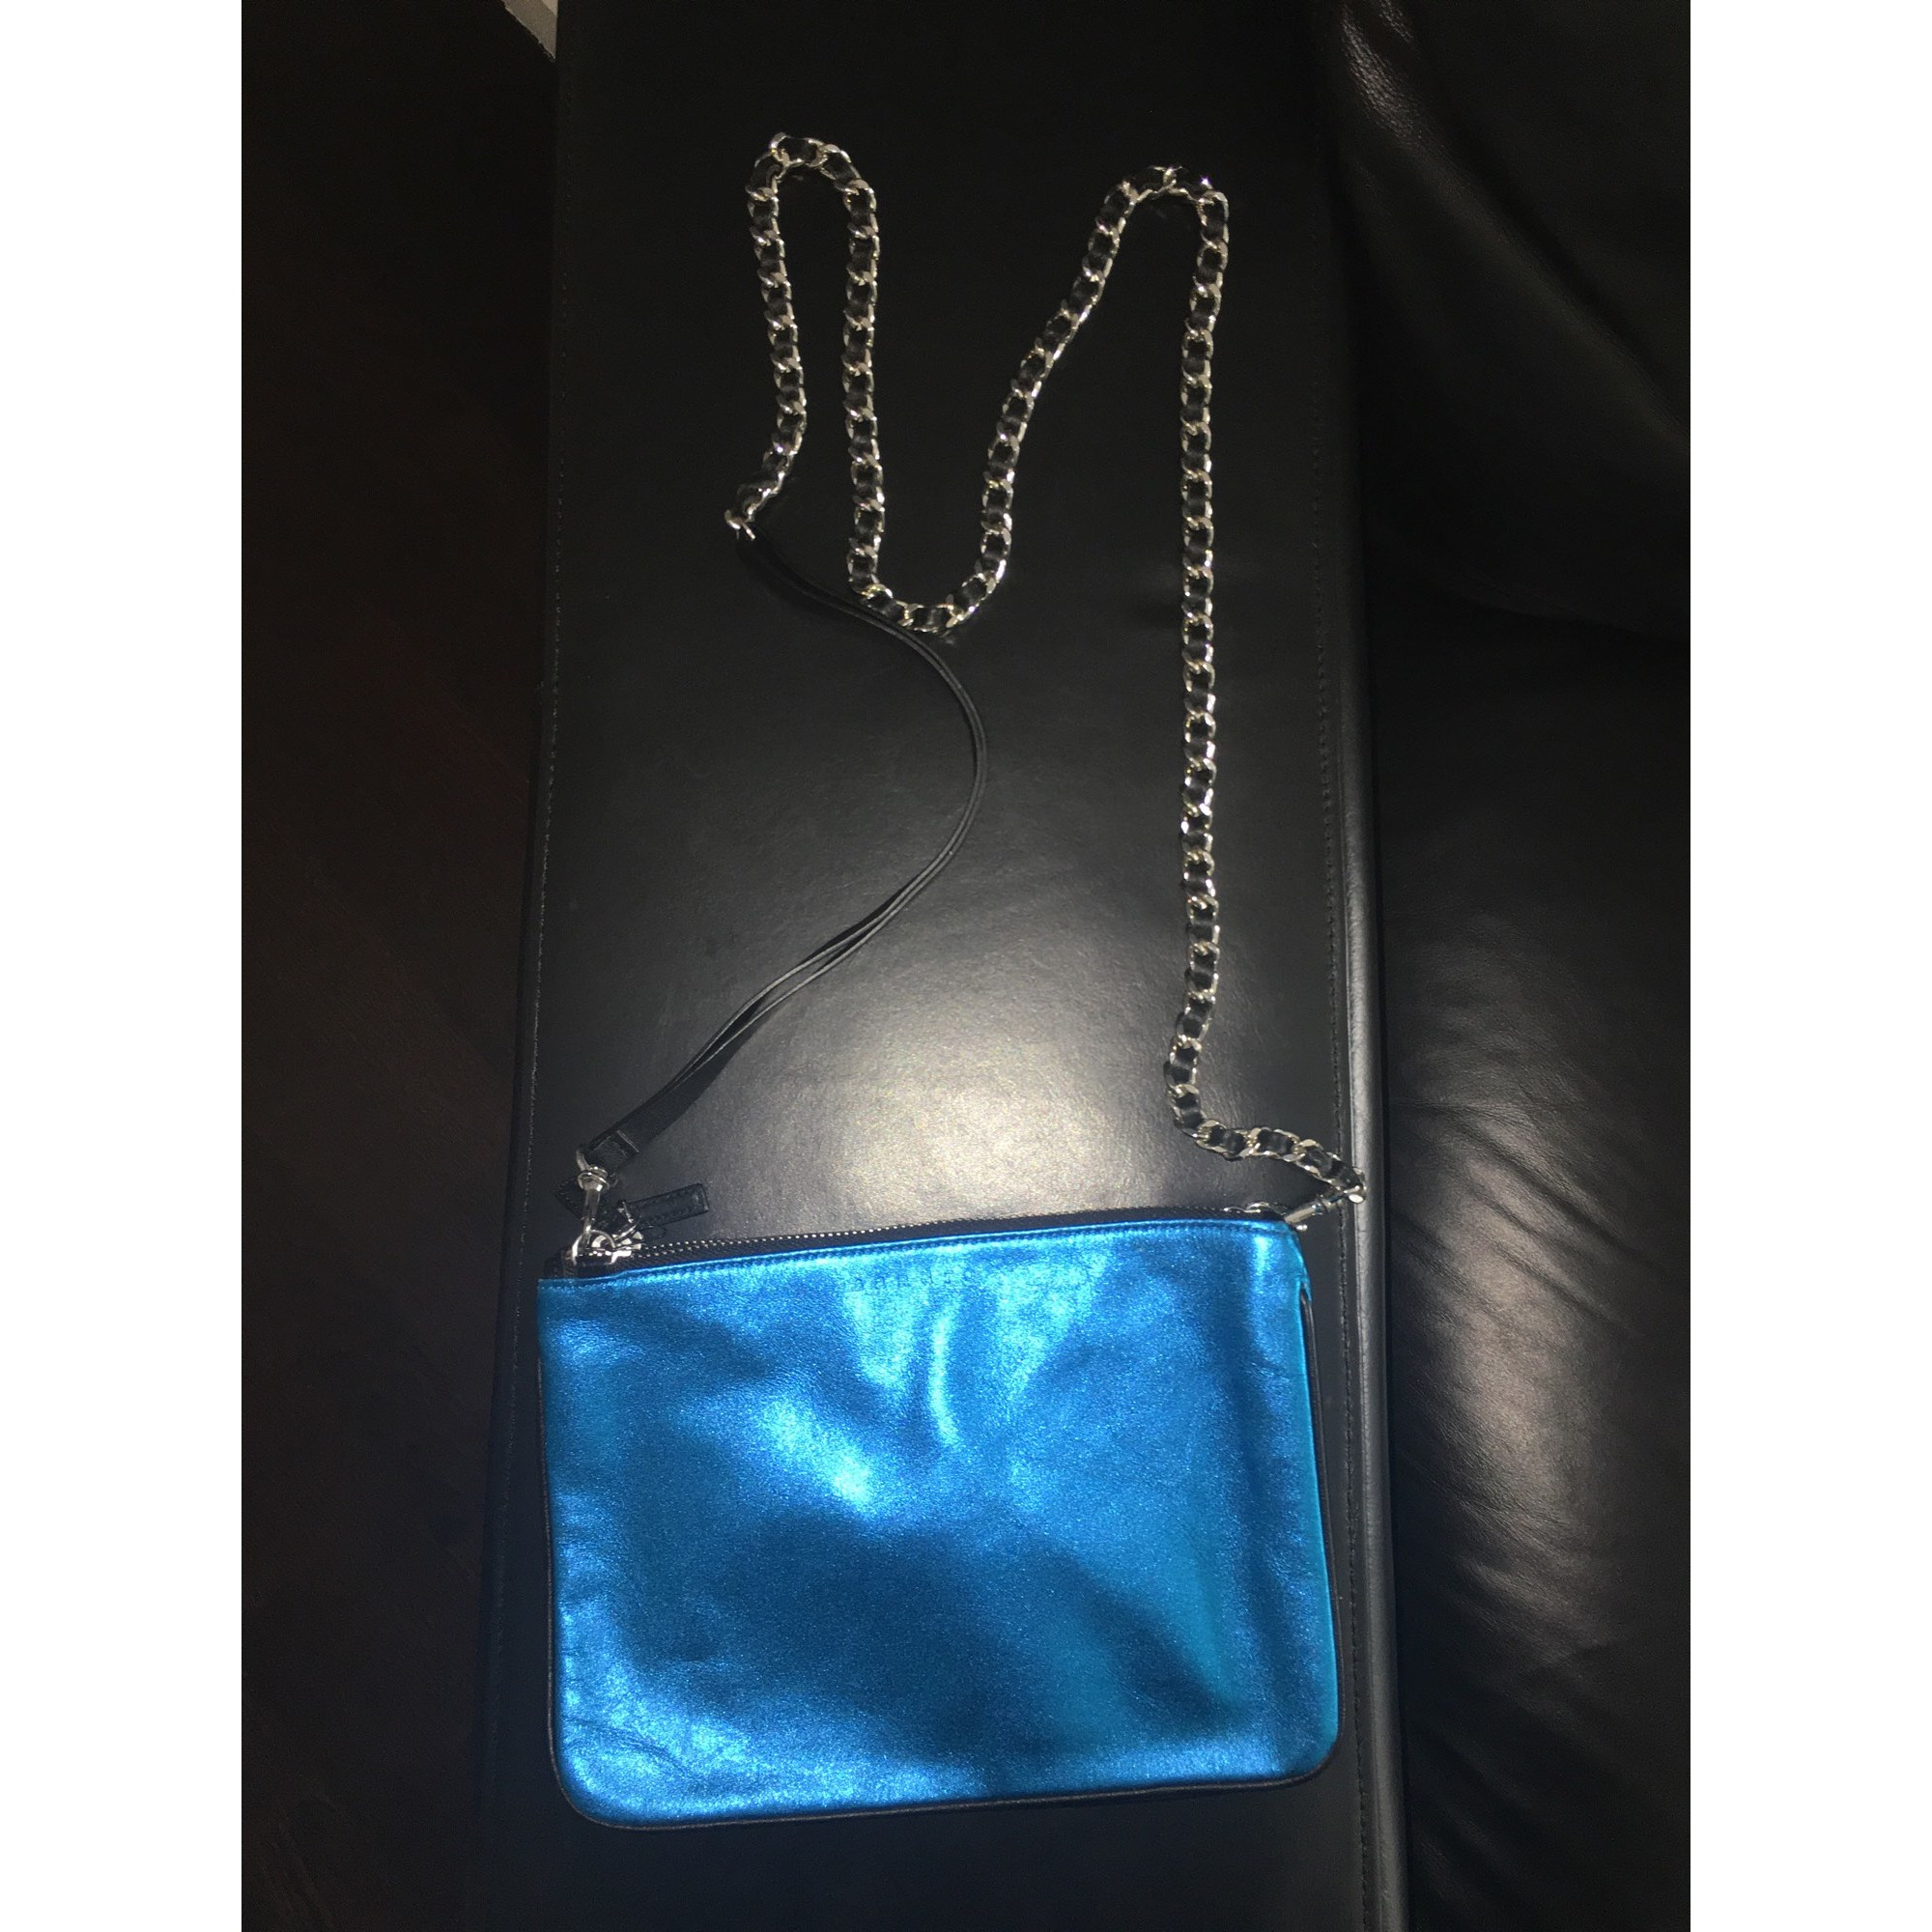 Sac pochette en cuir SANDRO Bleu, bleu marine, bleu turquoise